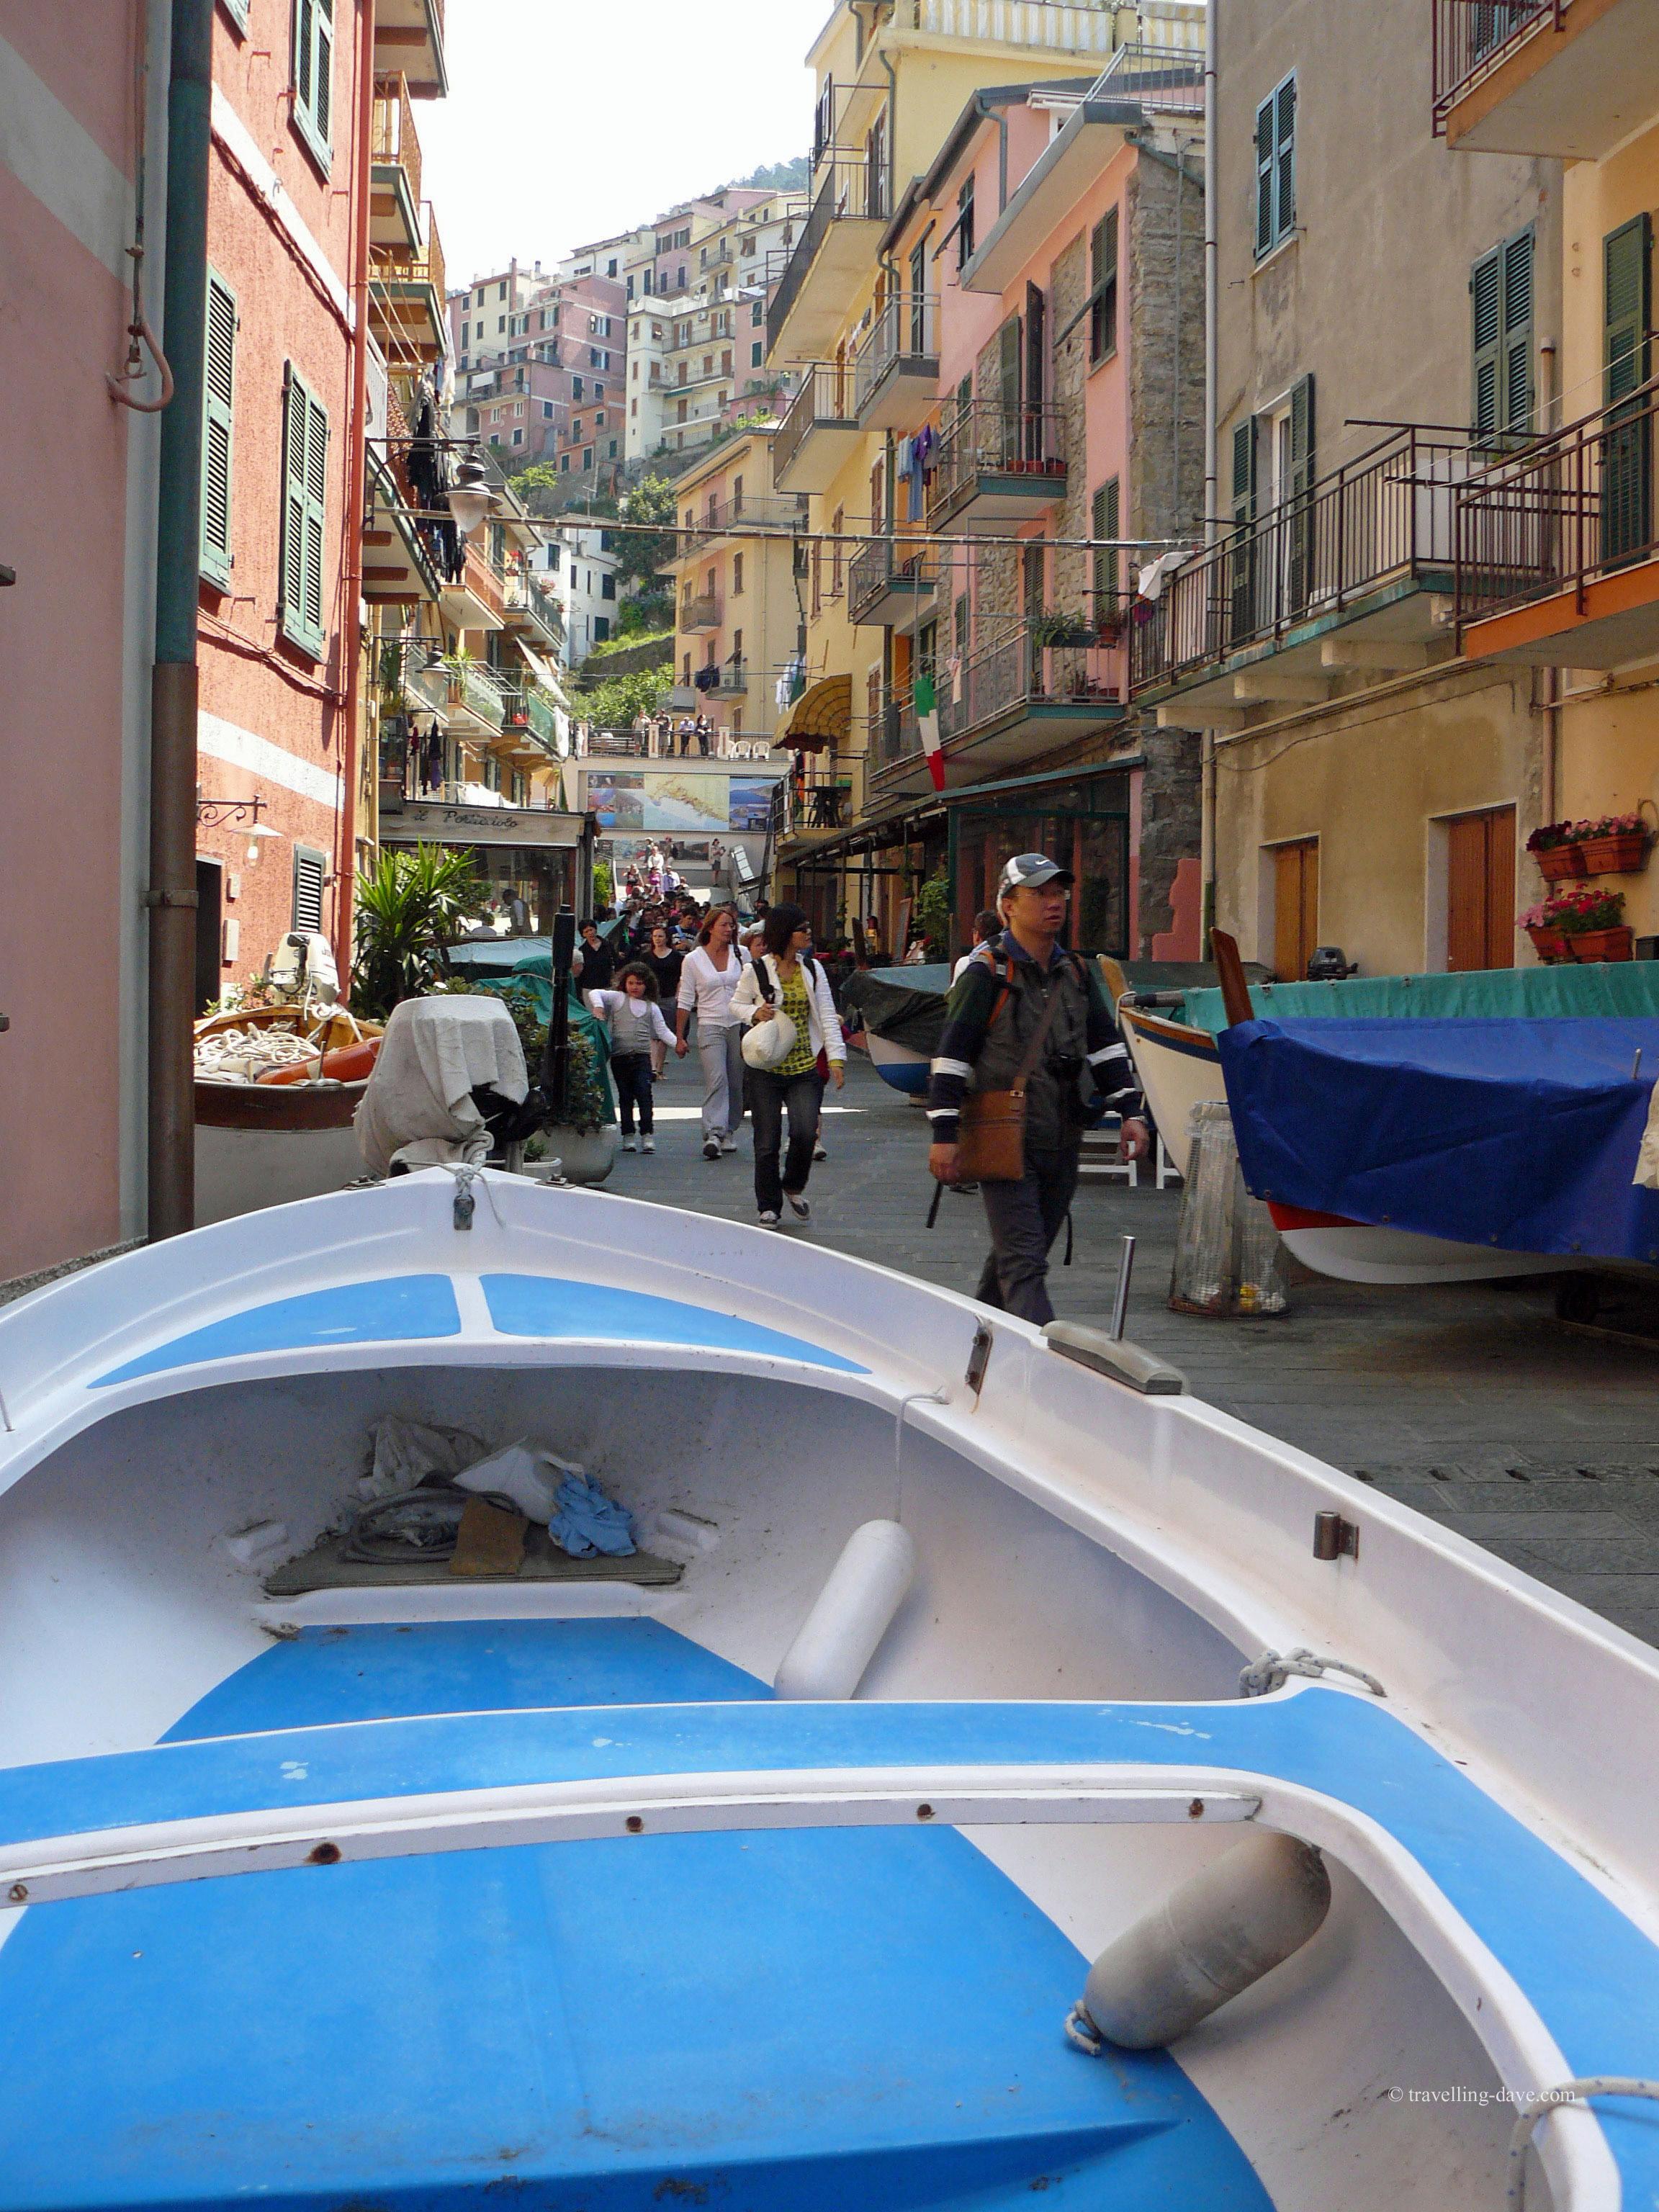 Photo of Manarola, one of the Cinque Terre